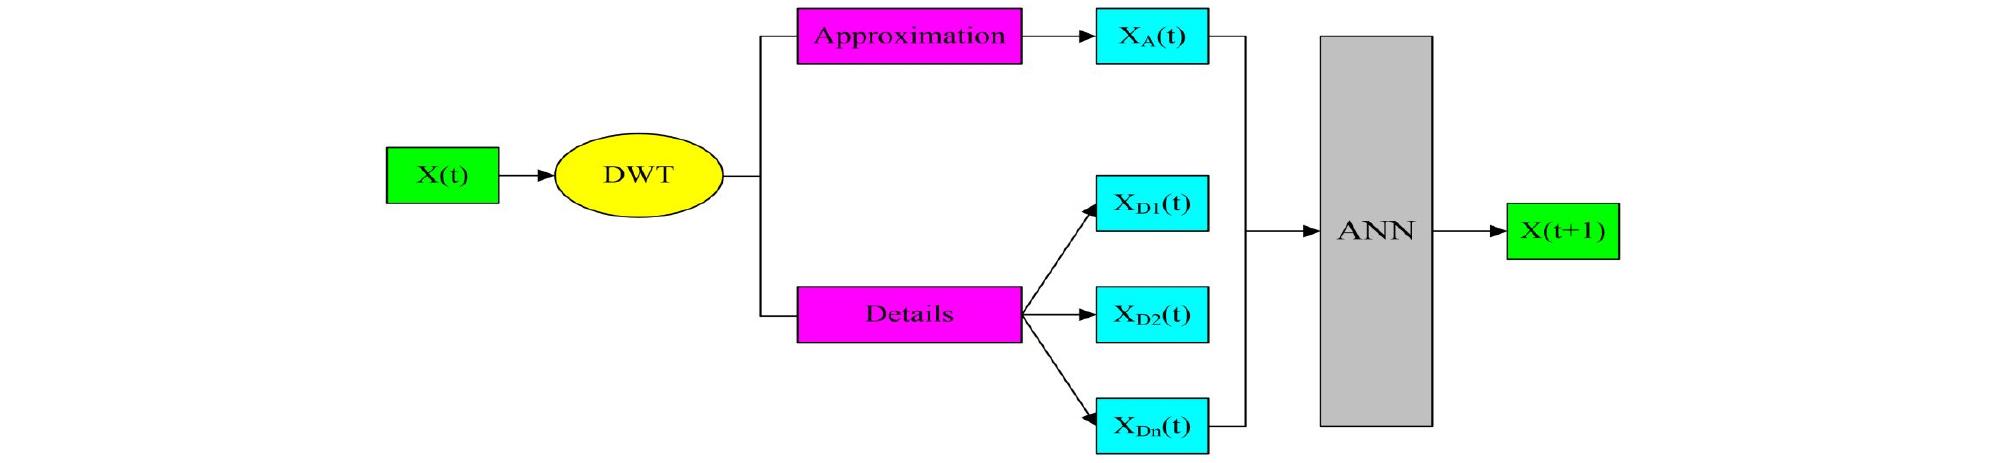 http://static.apub.kr/journalsite/sites/kwra/2020-053-06/N0200530601/images/kwra_53_06_01_F5.jpg